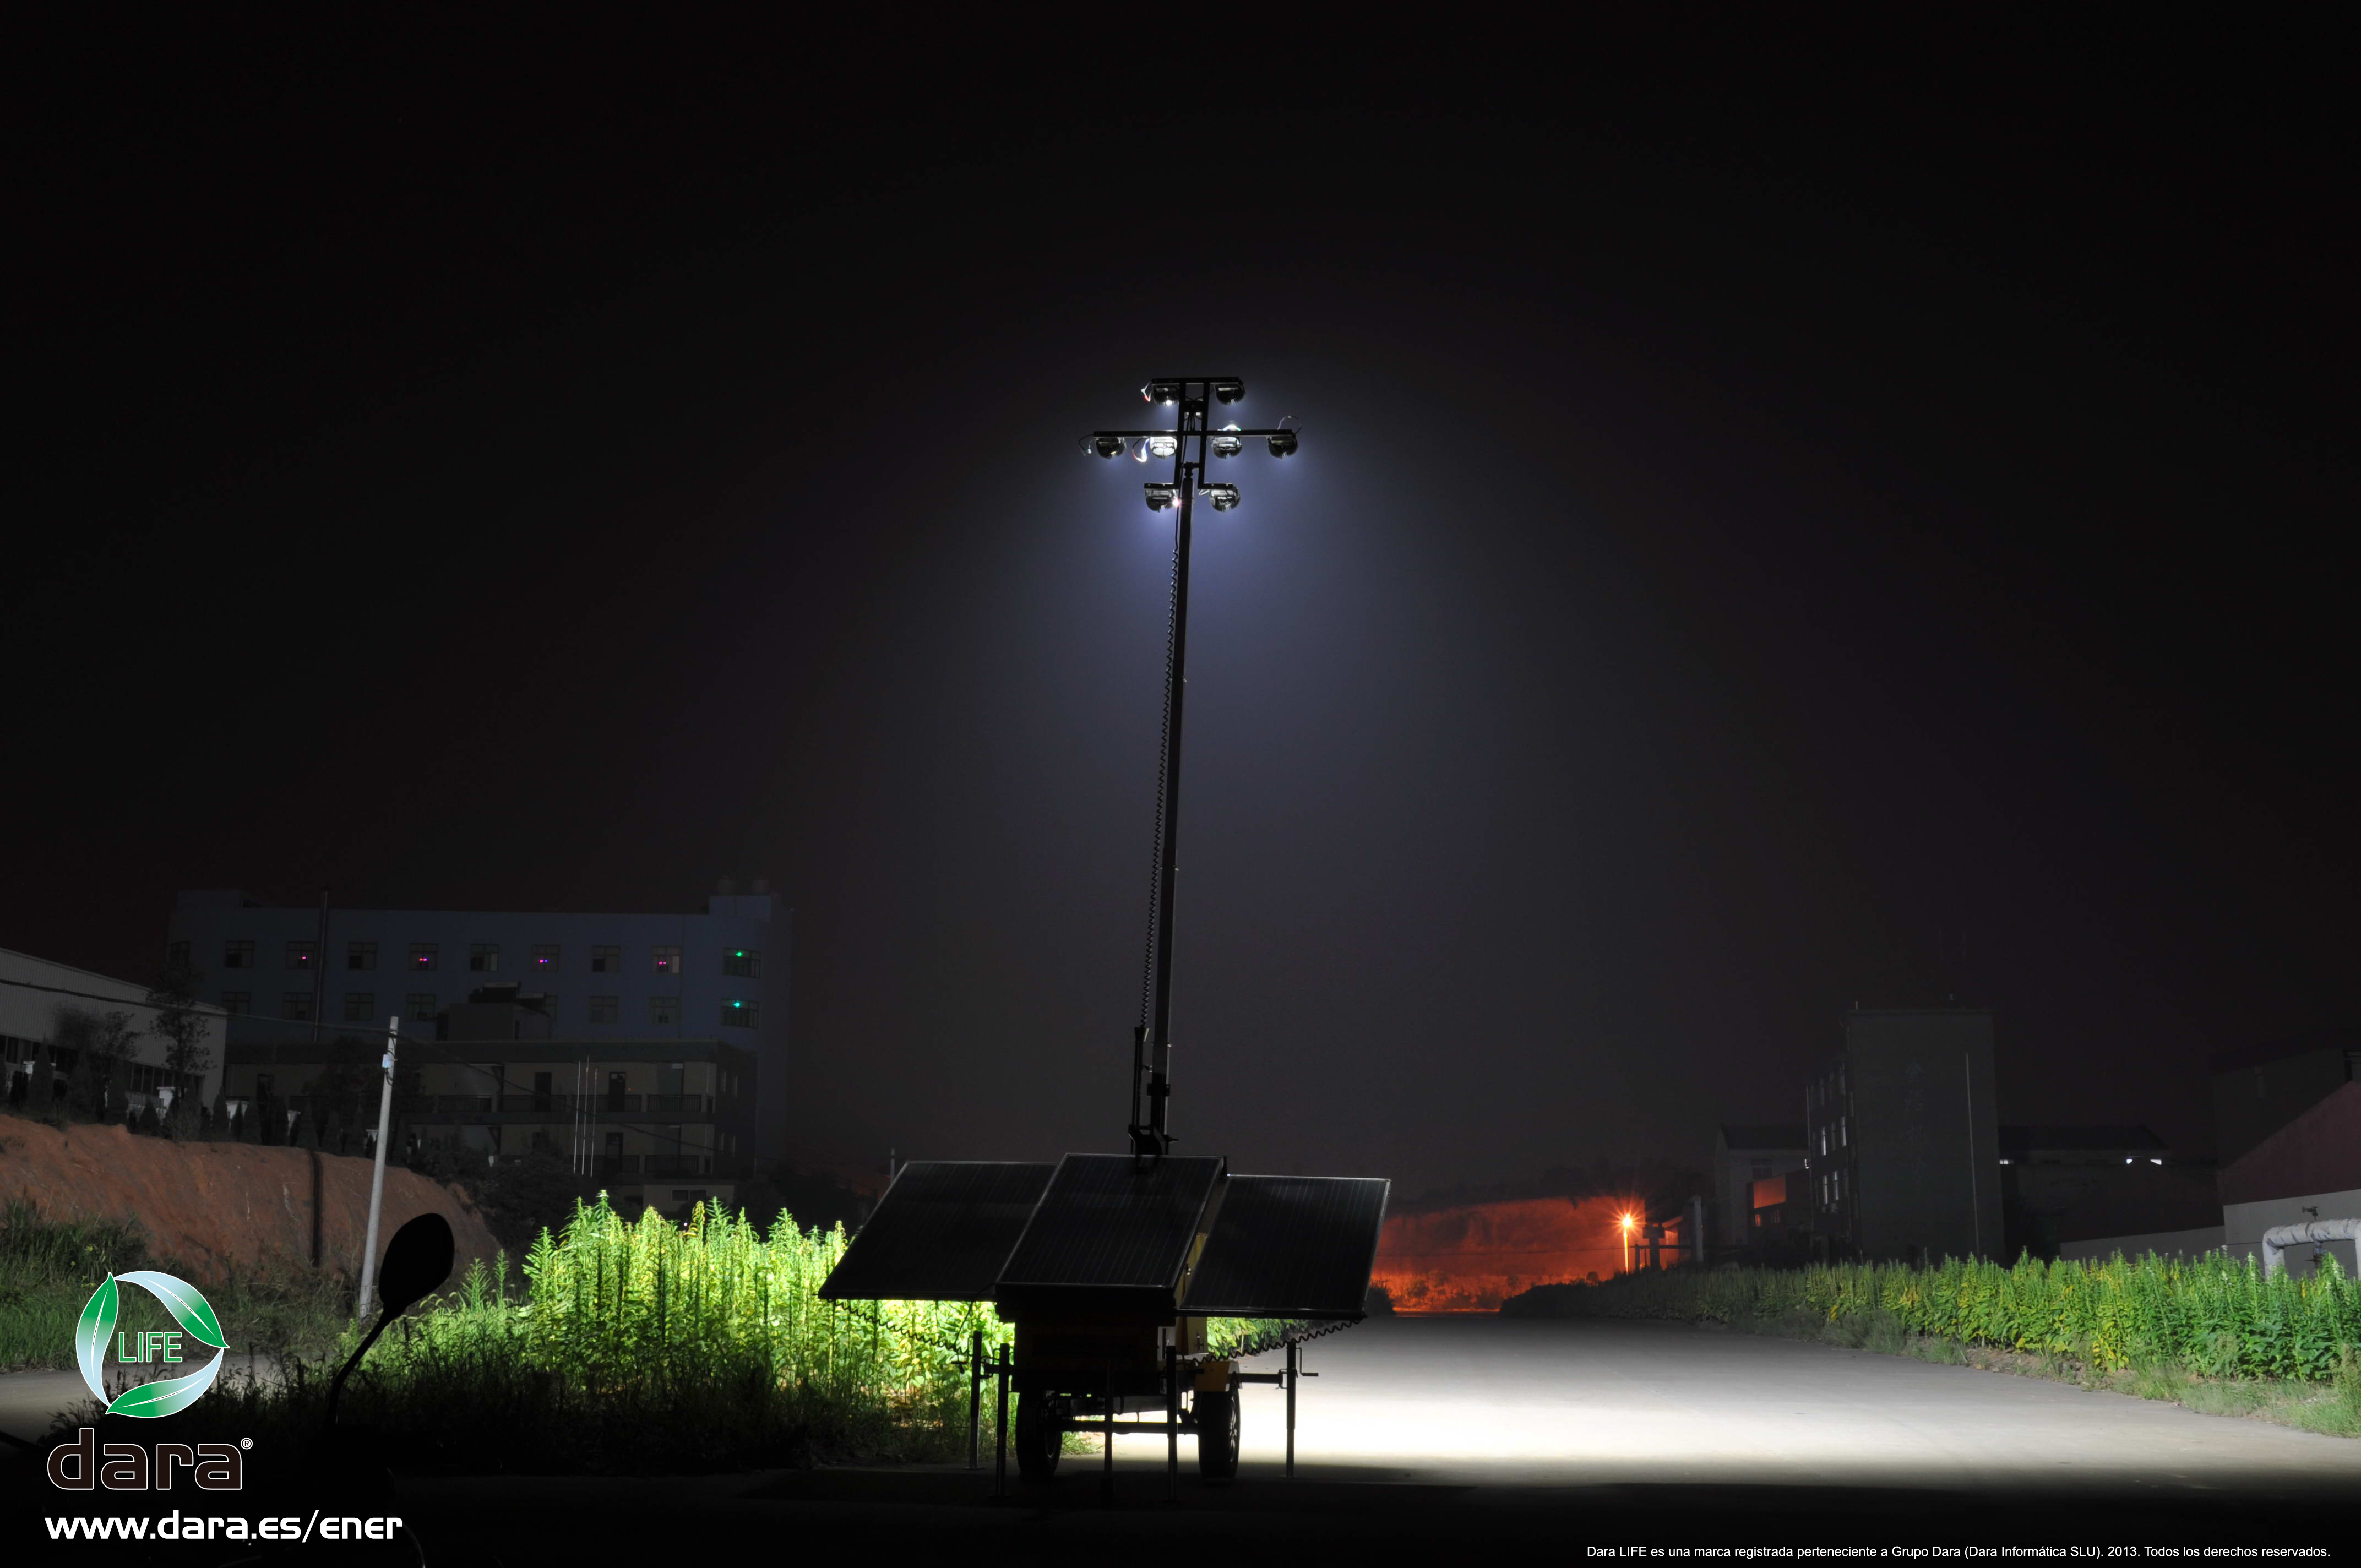 Dara life greenlight torre de iluminaci n solar m vil for Iluminacion de exterior solar